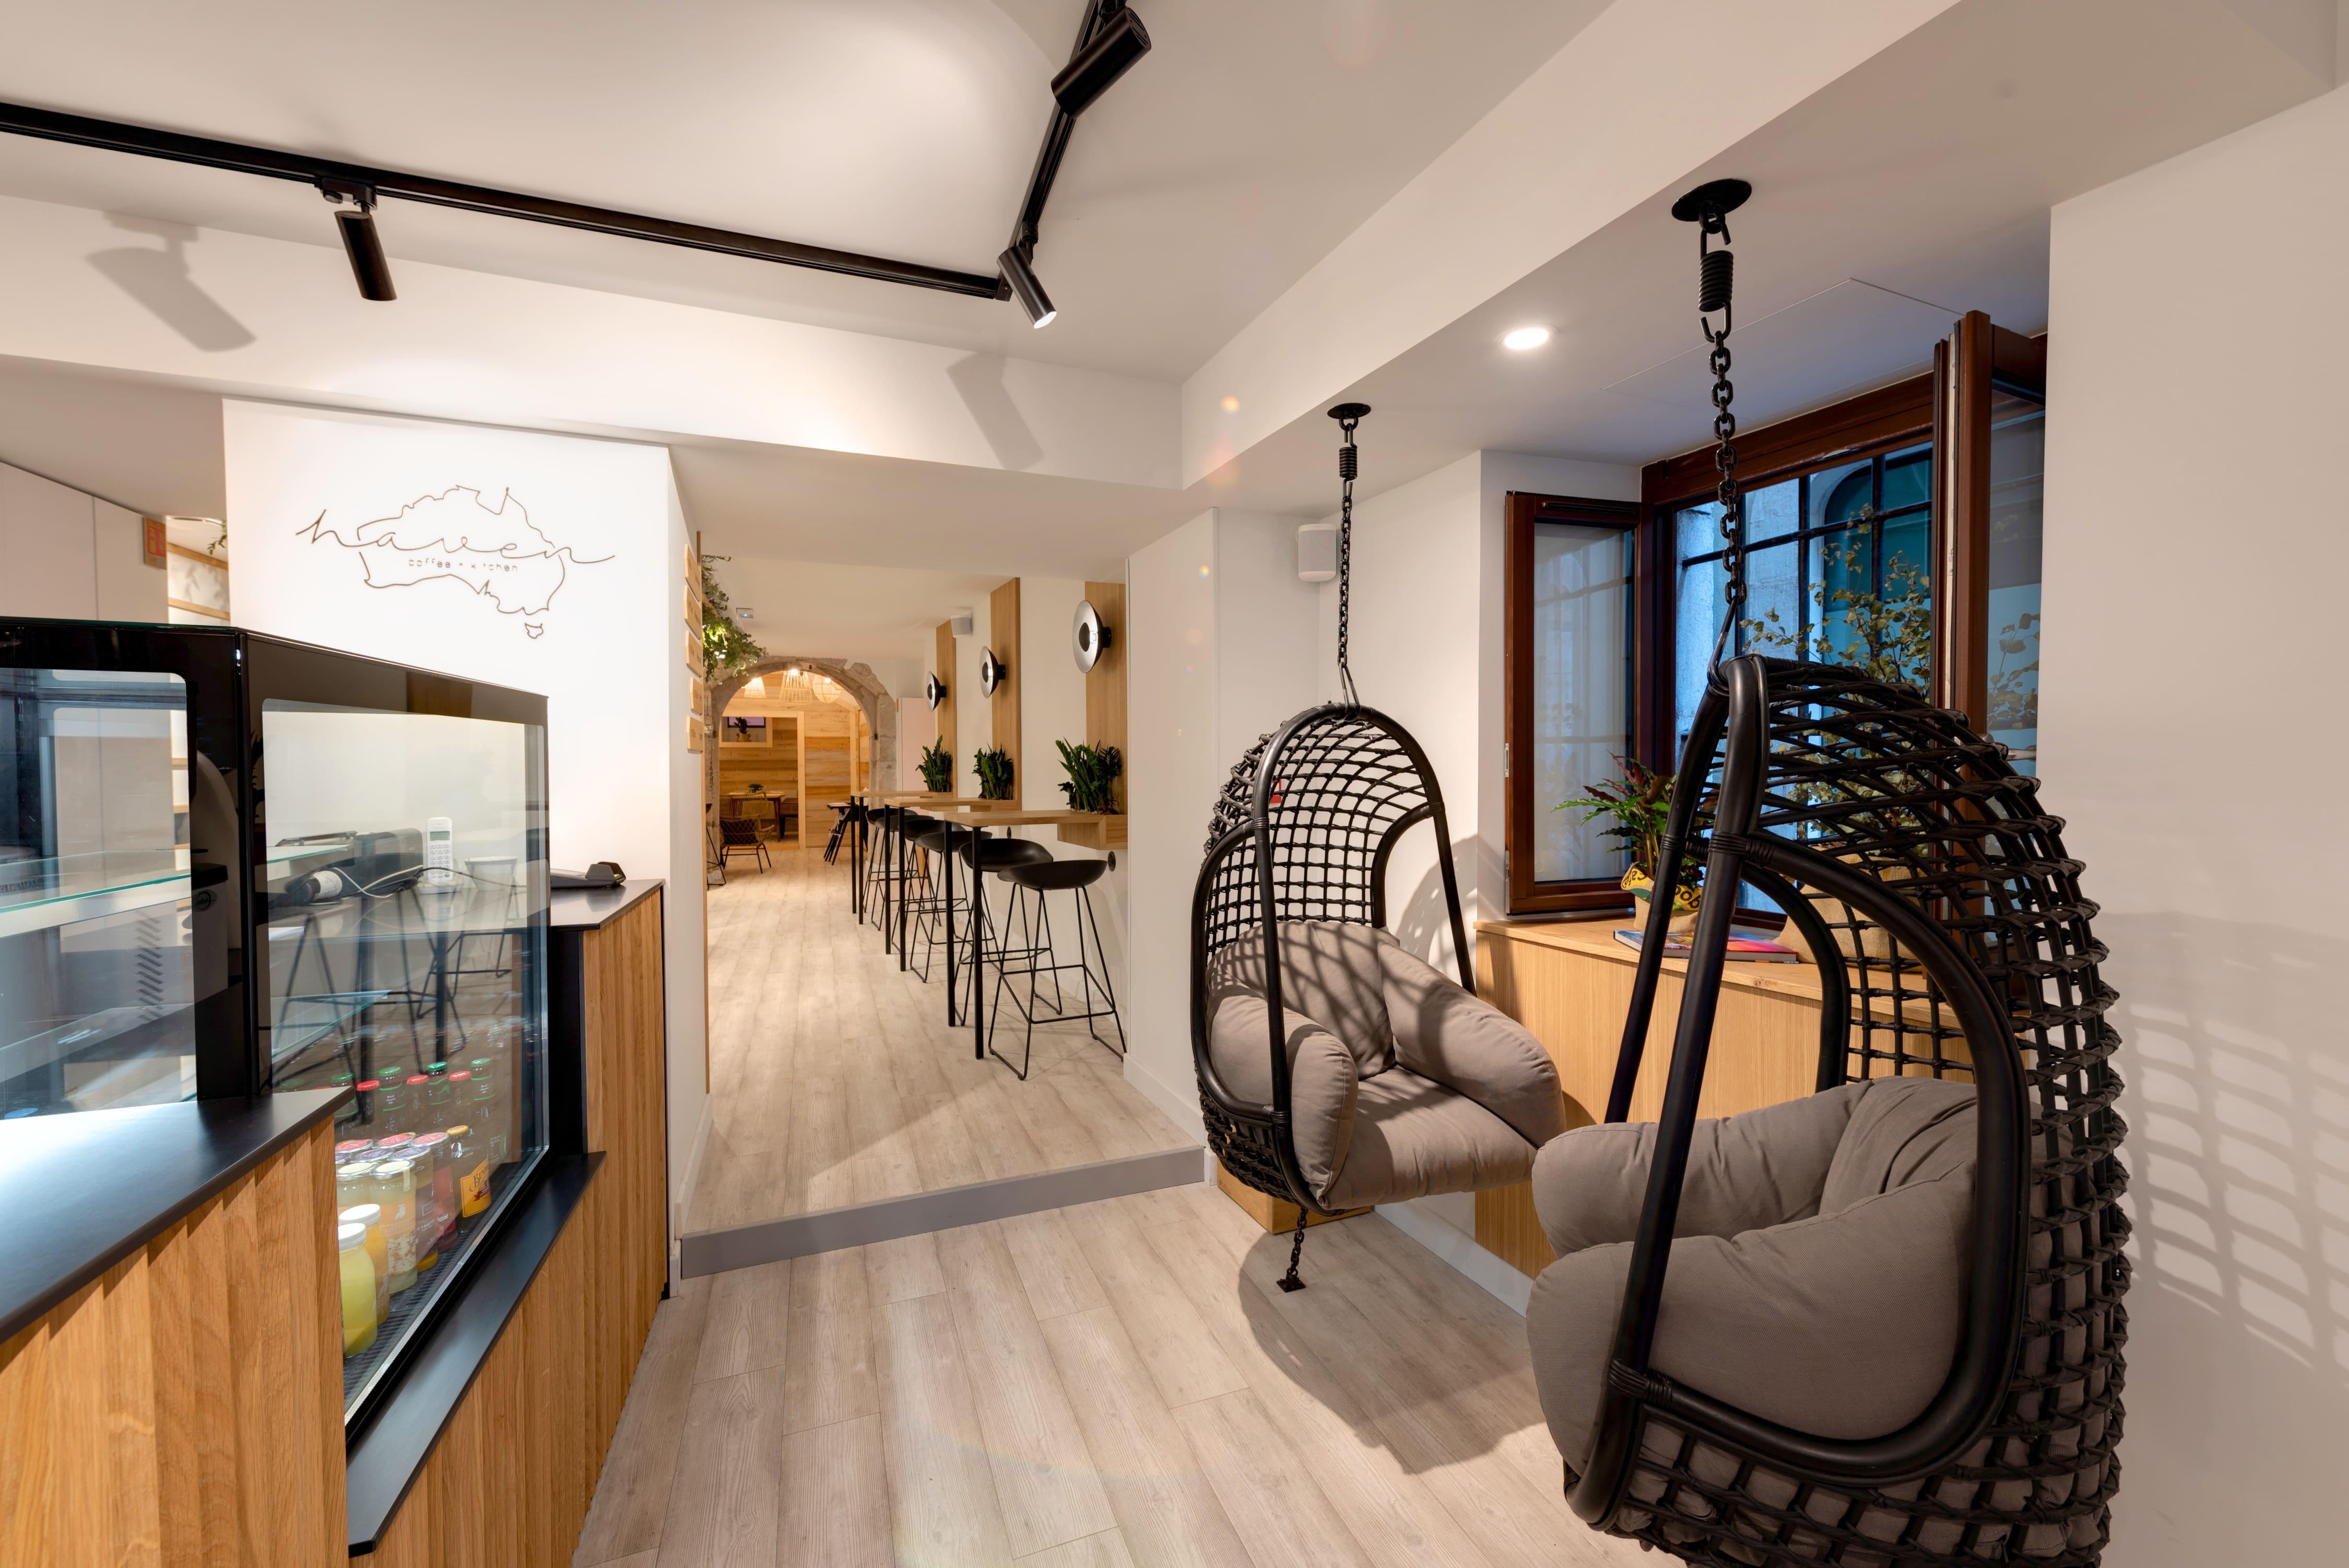 Agencement interieur design métallique ROBI restaurant Haven Annecy 74 agencement en metal 9